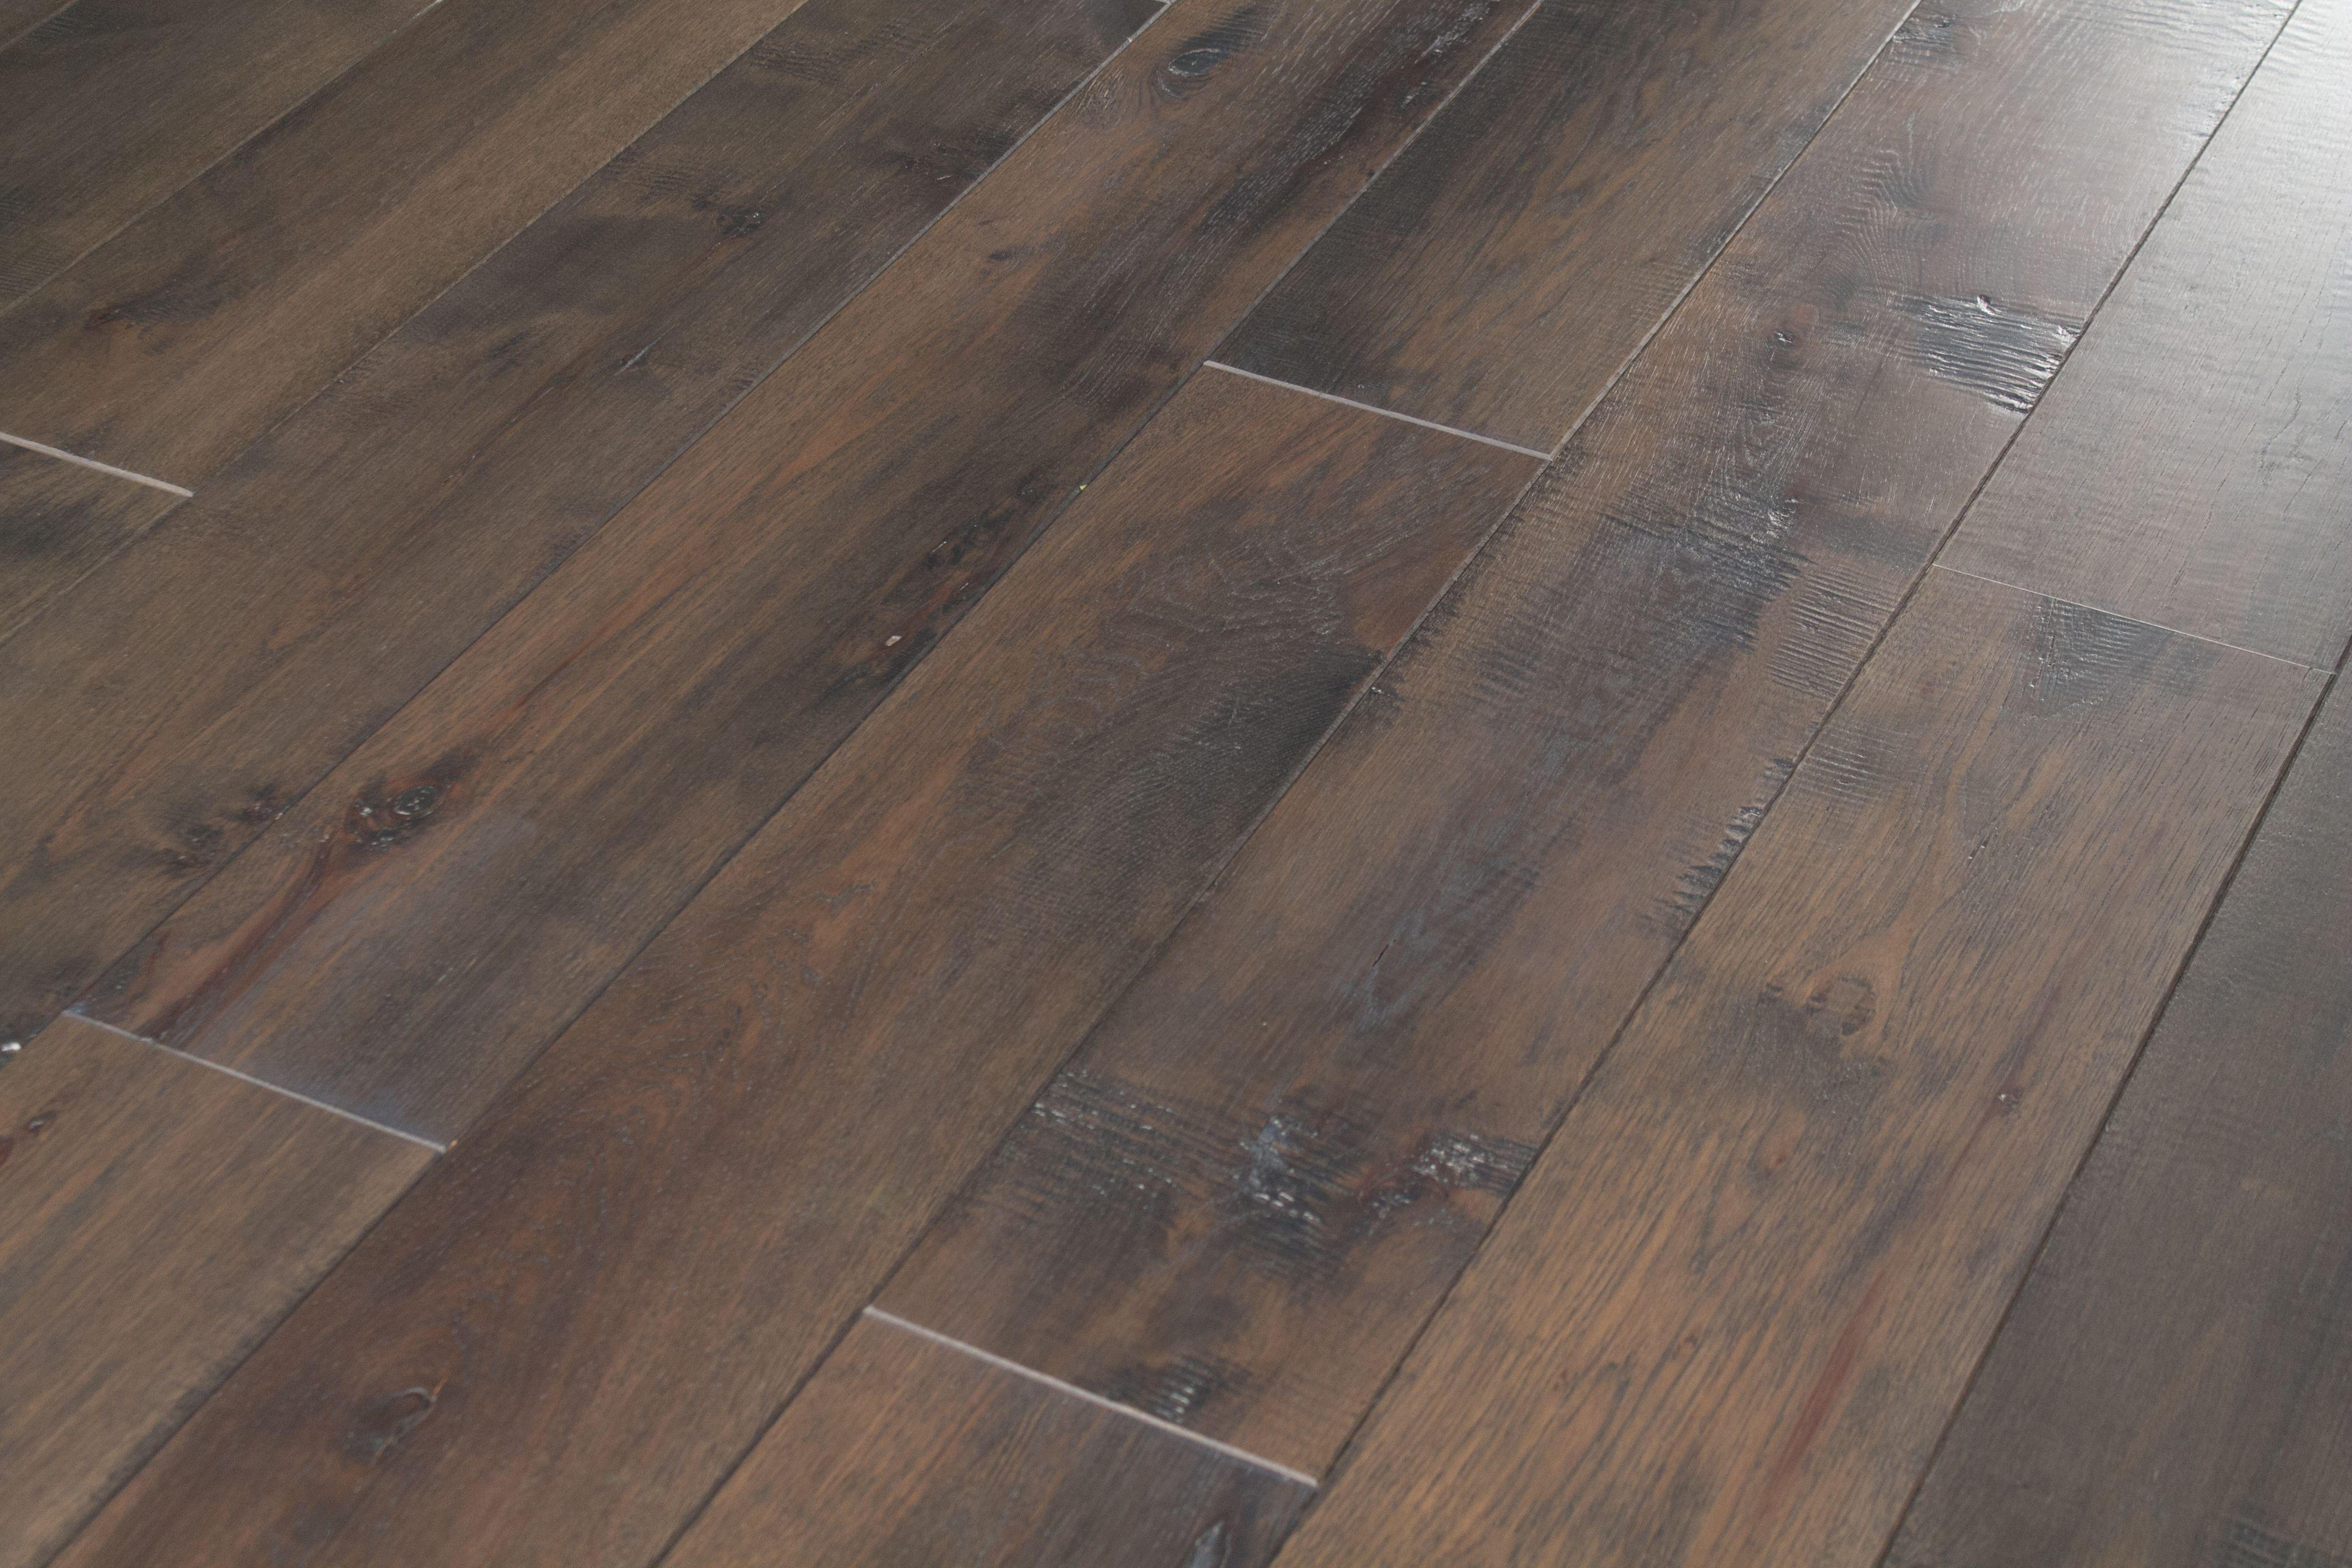 hand scraped hardwood flooring wide plank of wide plank hand scraped dark brown hickory hardwood floori for wide plank hand scraped gray and brown hickory hardwood flooring